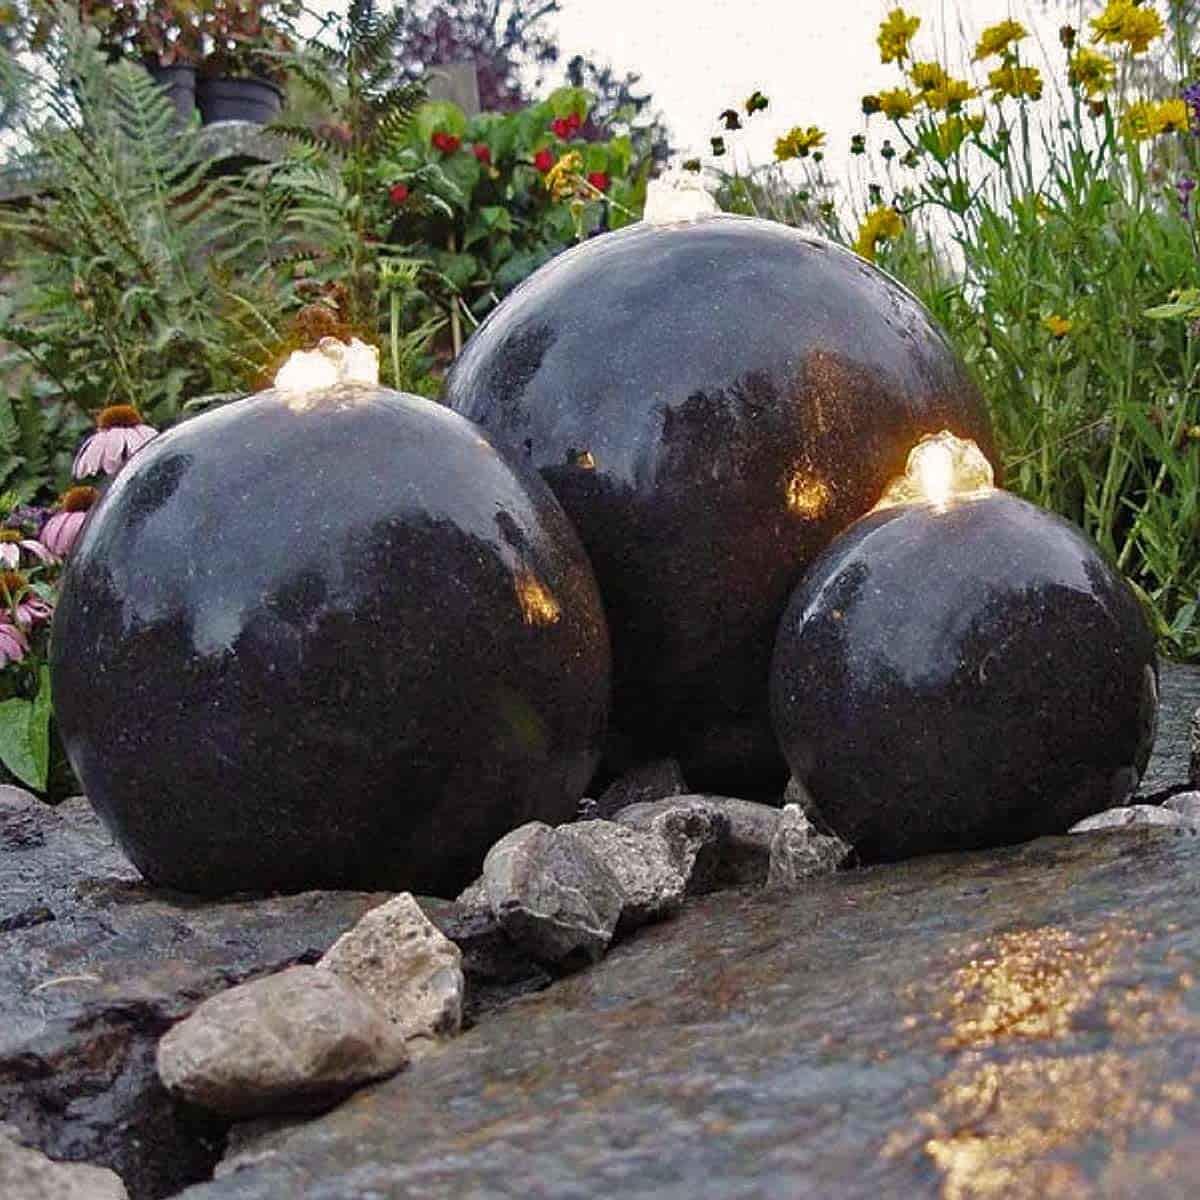 fontaine de jardin lumineuse 3 spheres